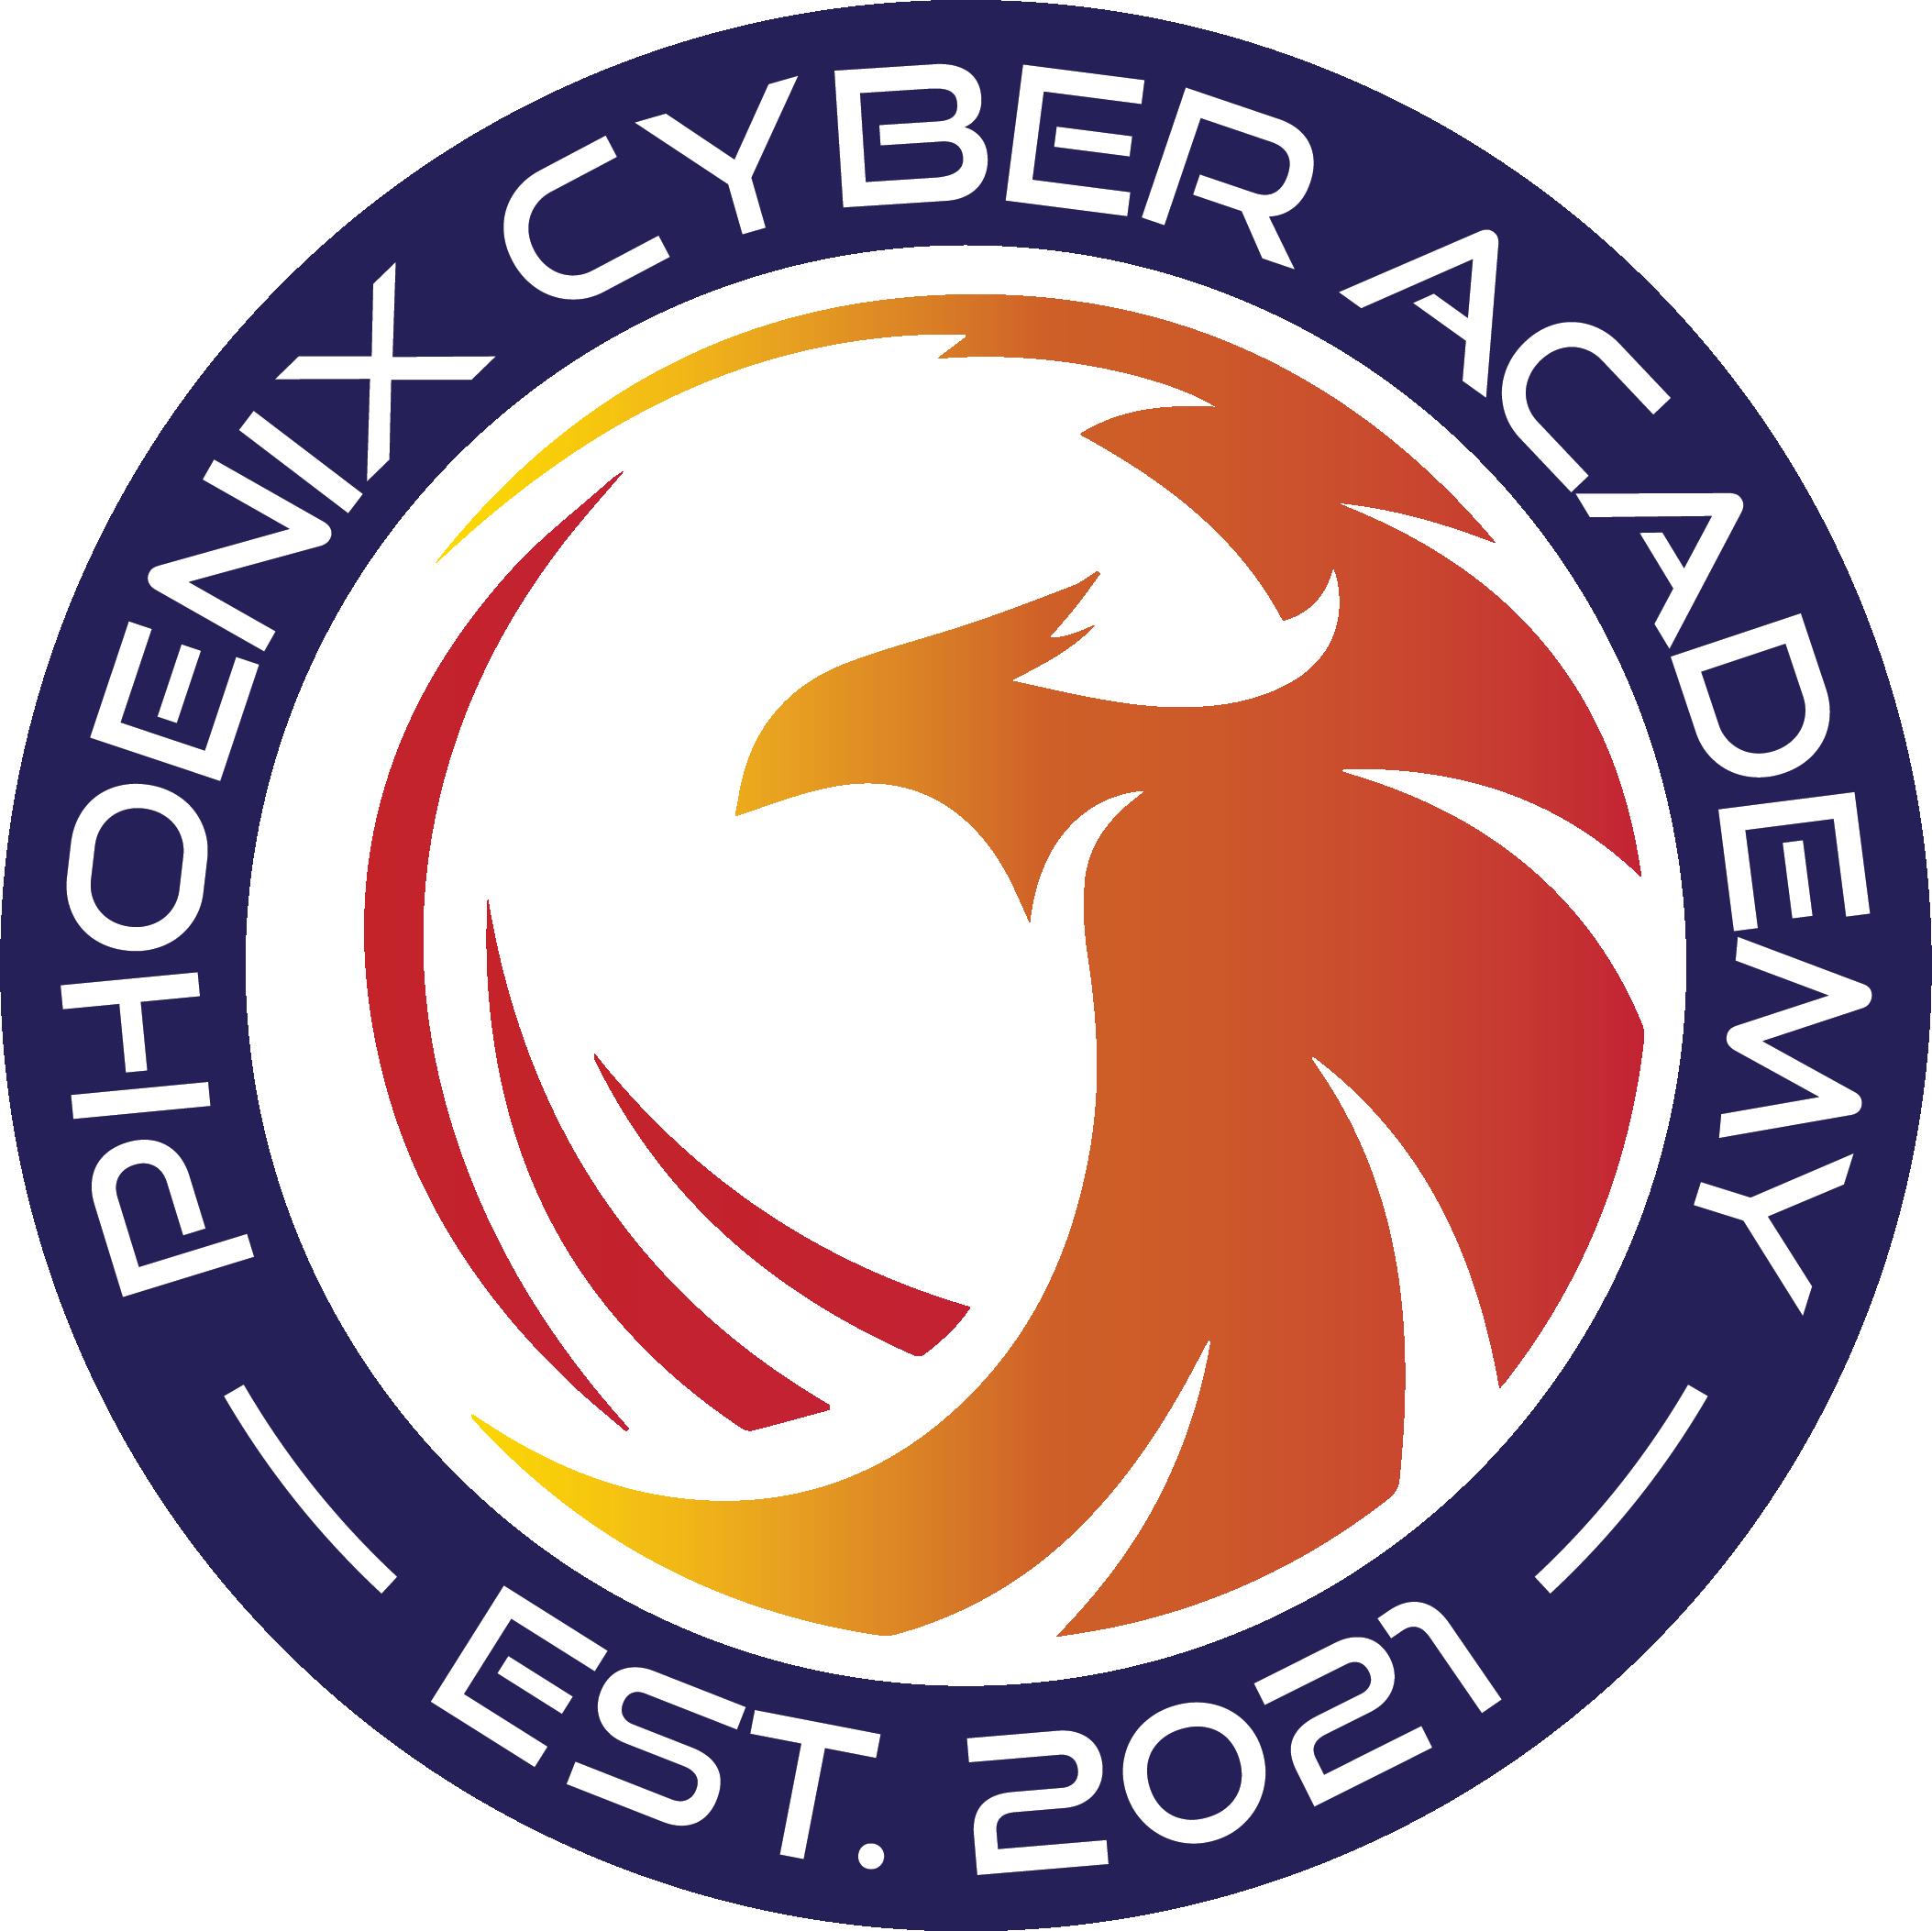 Phoenix Cyber Academy